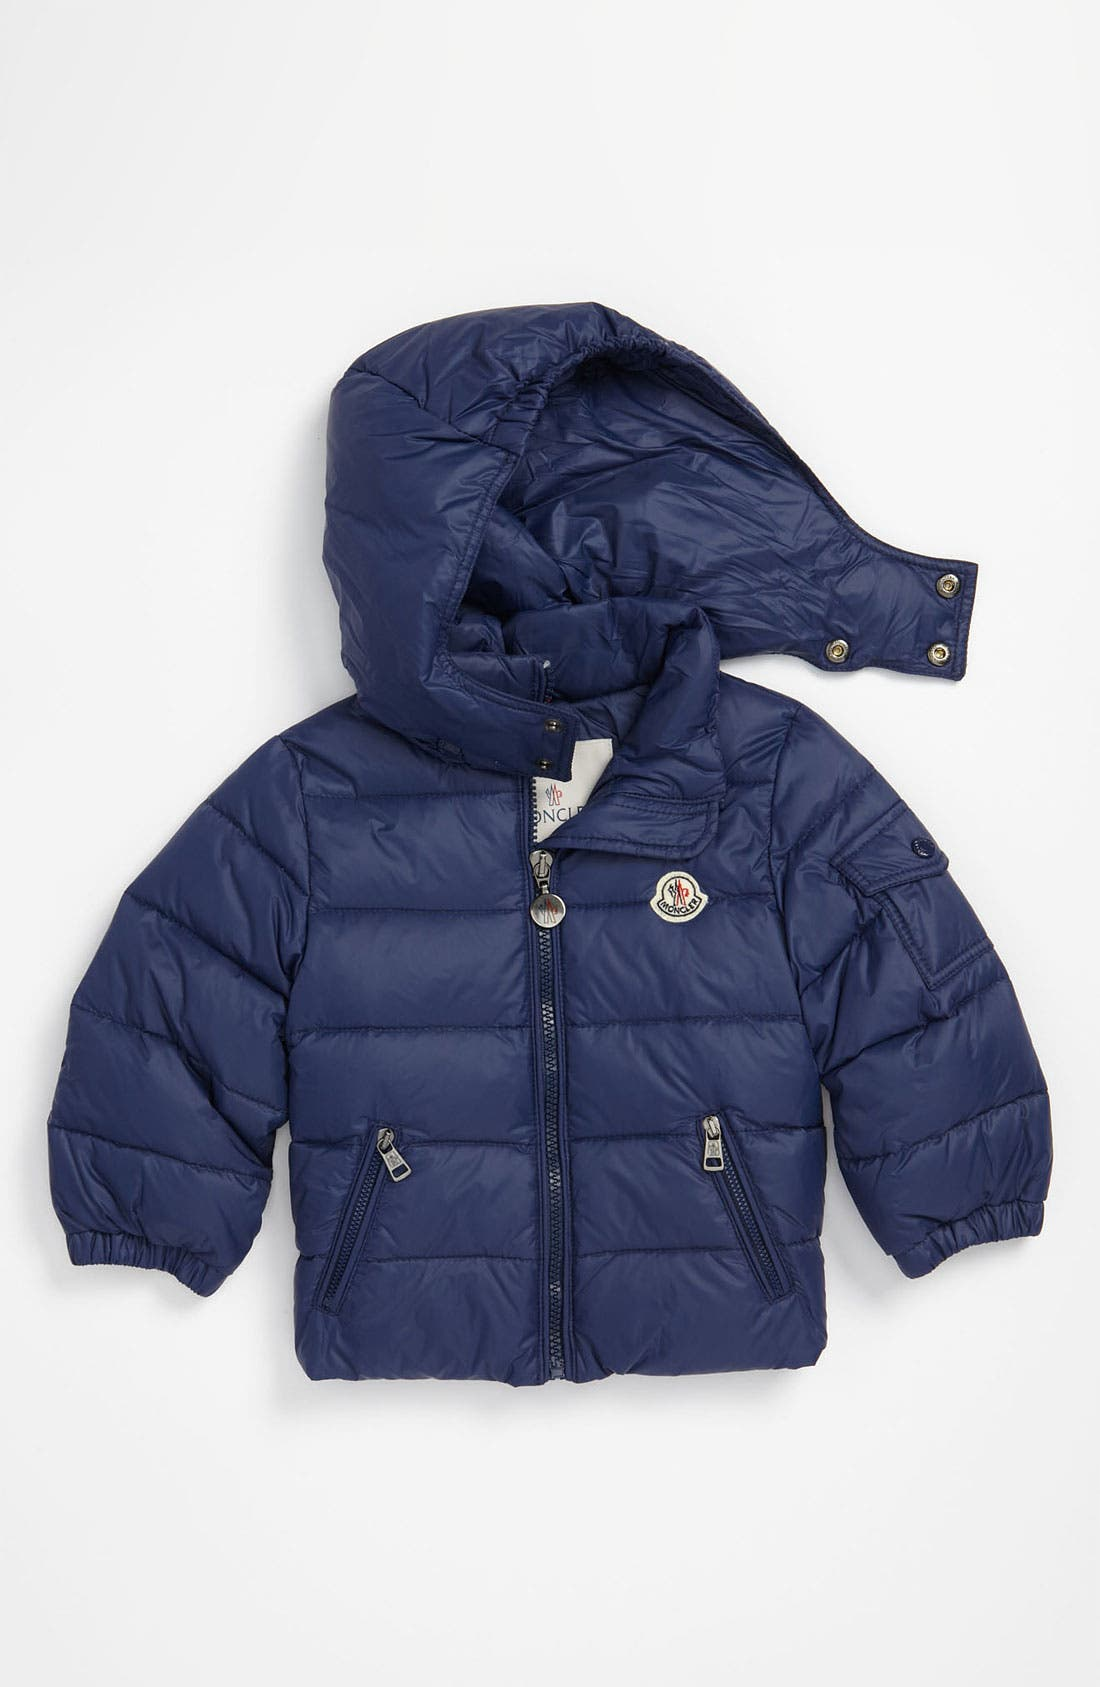 Alternate Image 1 Selected - Moncler Puffer Jacket (Toddler)